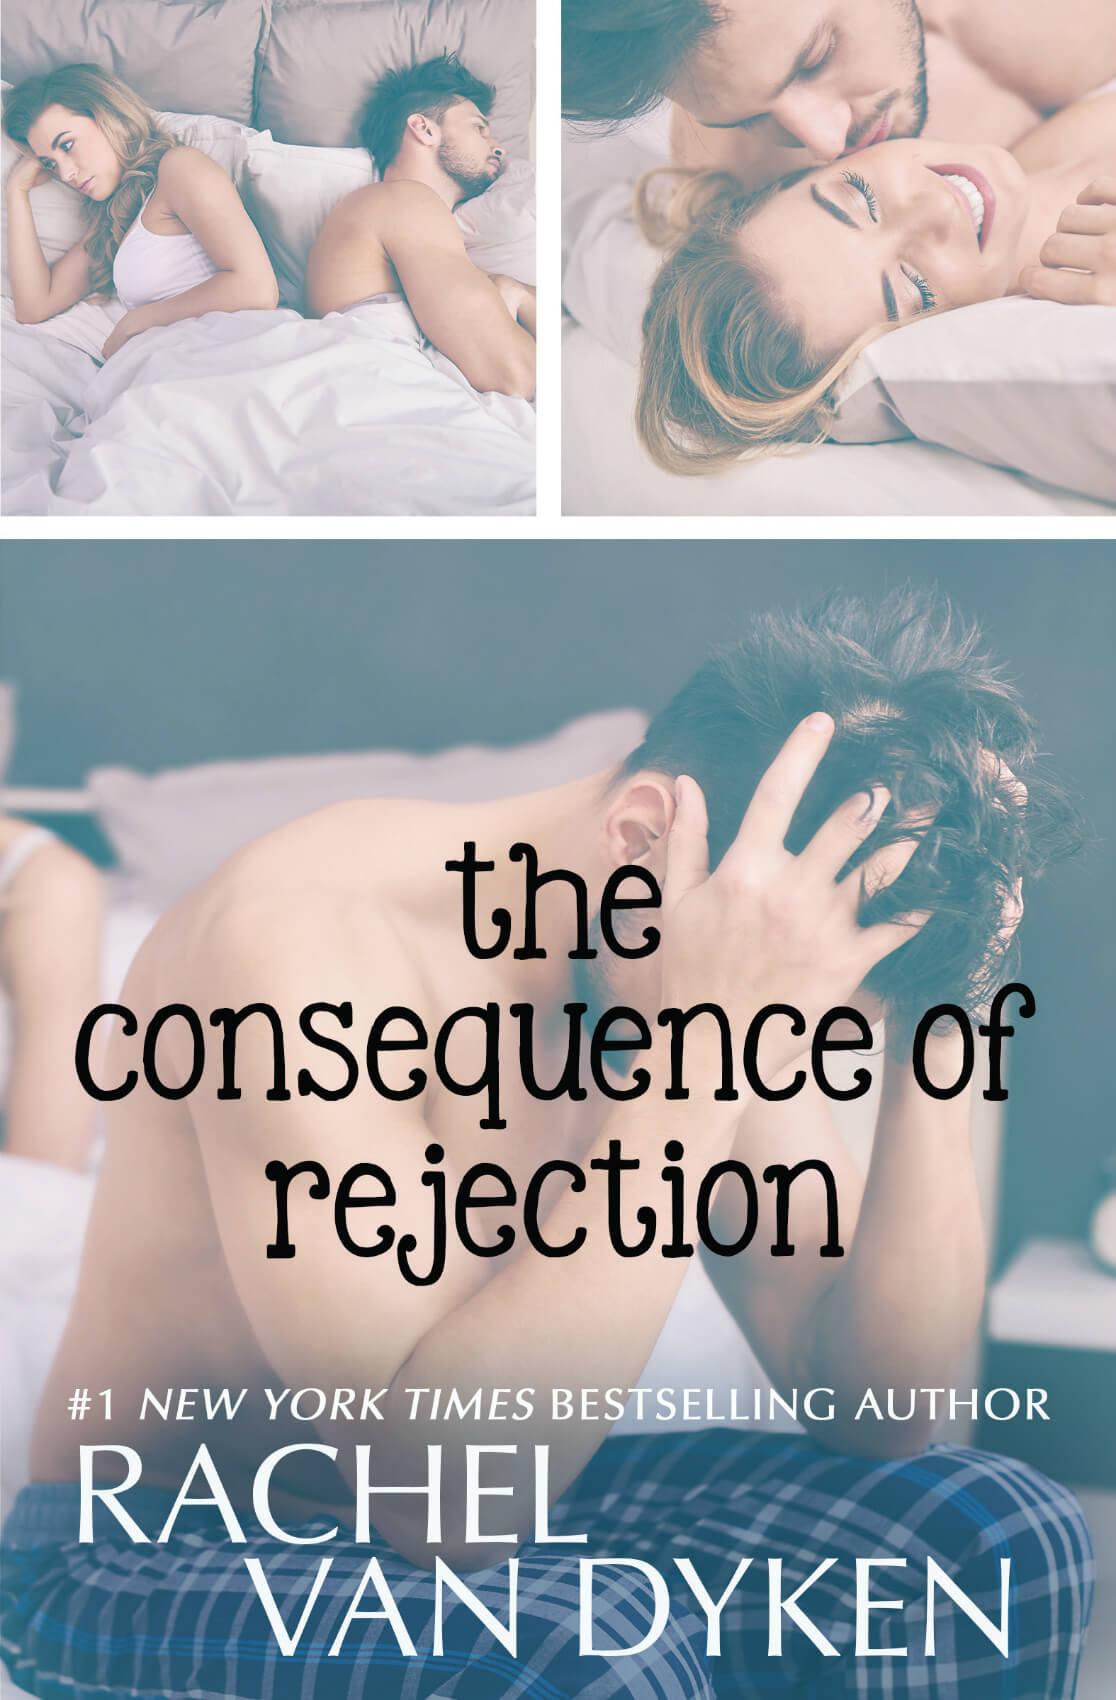 The Consequence of Rejection by Rachel Van Dyken @rachvd